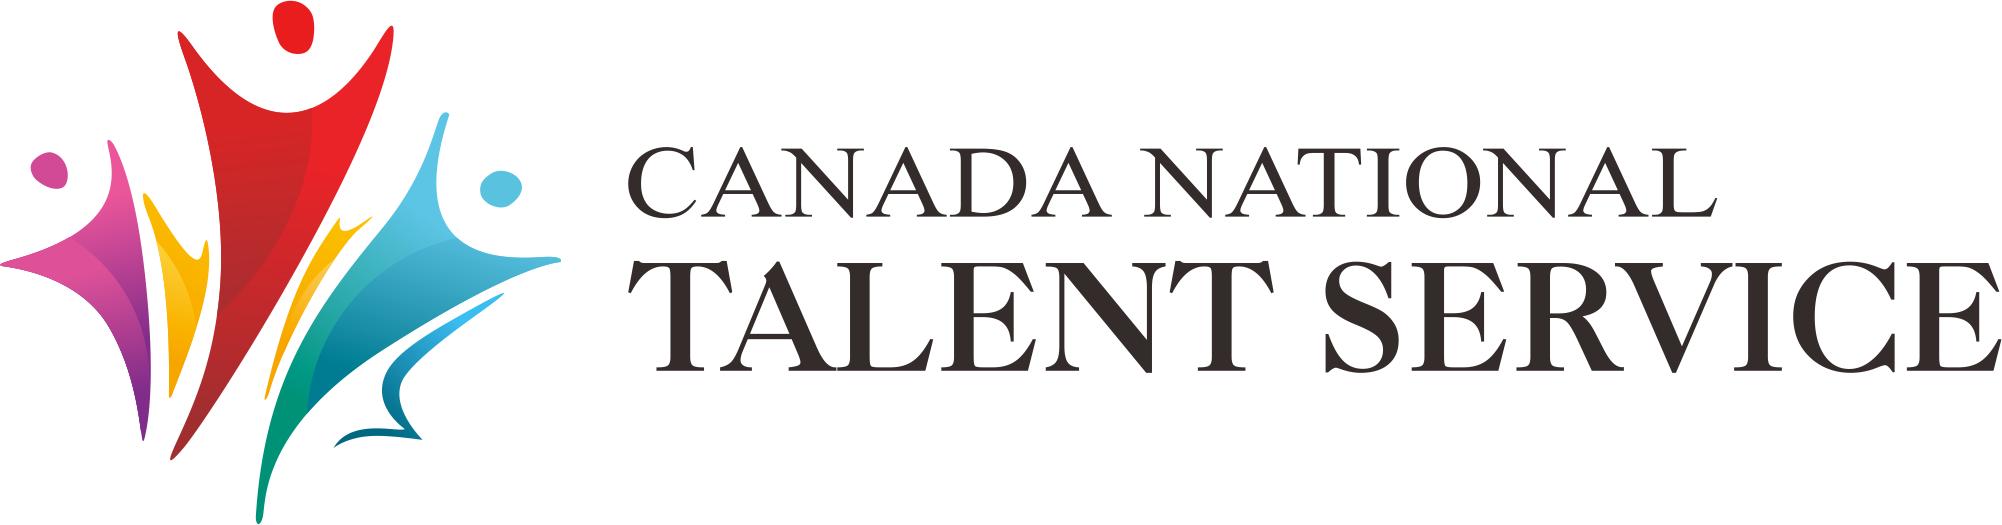 Talent of Canada